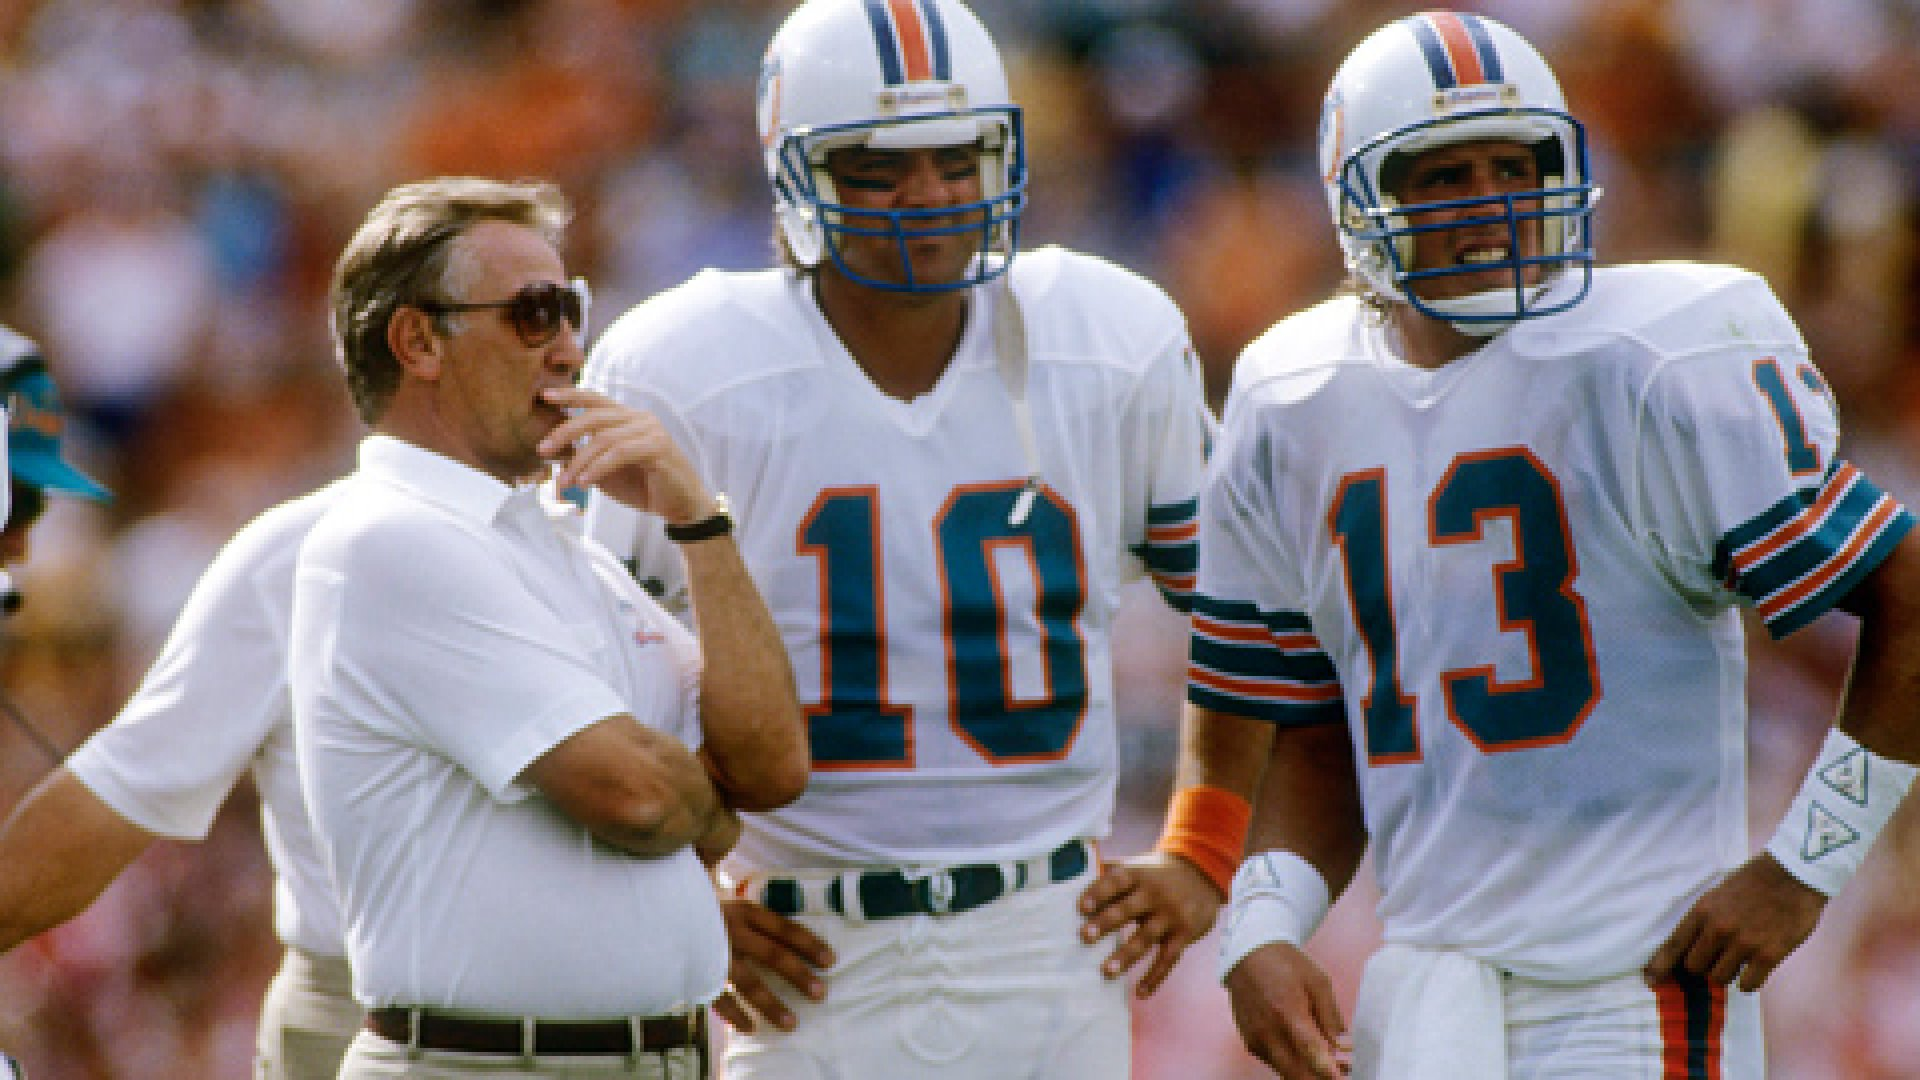 Head Coach Don Shula talks with quarterbacks Dan Marino #13 and Don Strock #10 circa mid 1980's.